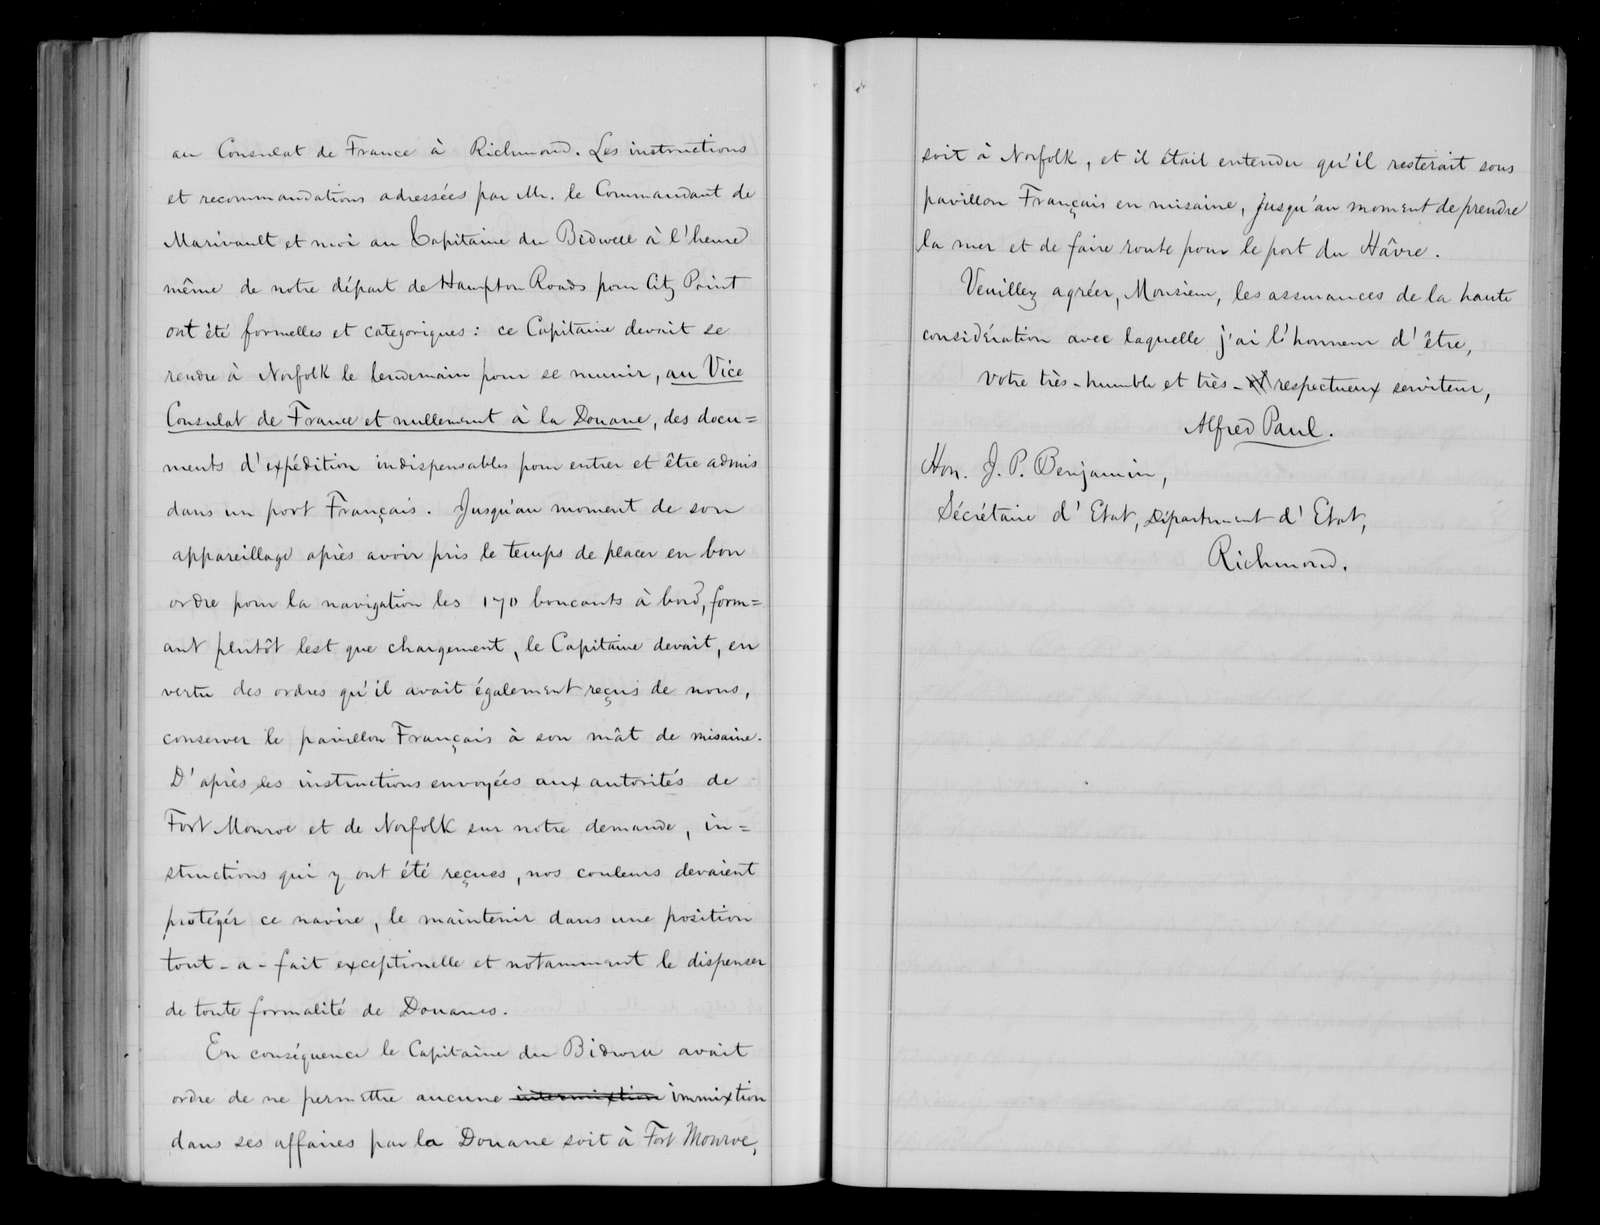 Confederate States of America records: Microfilm Reel 31